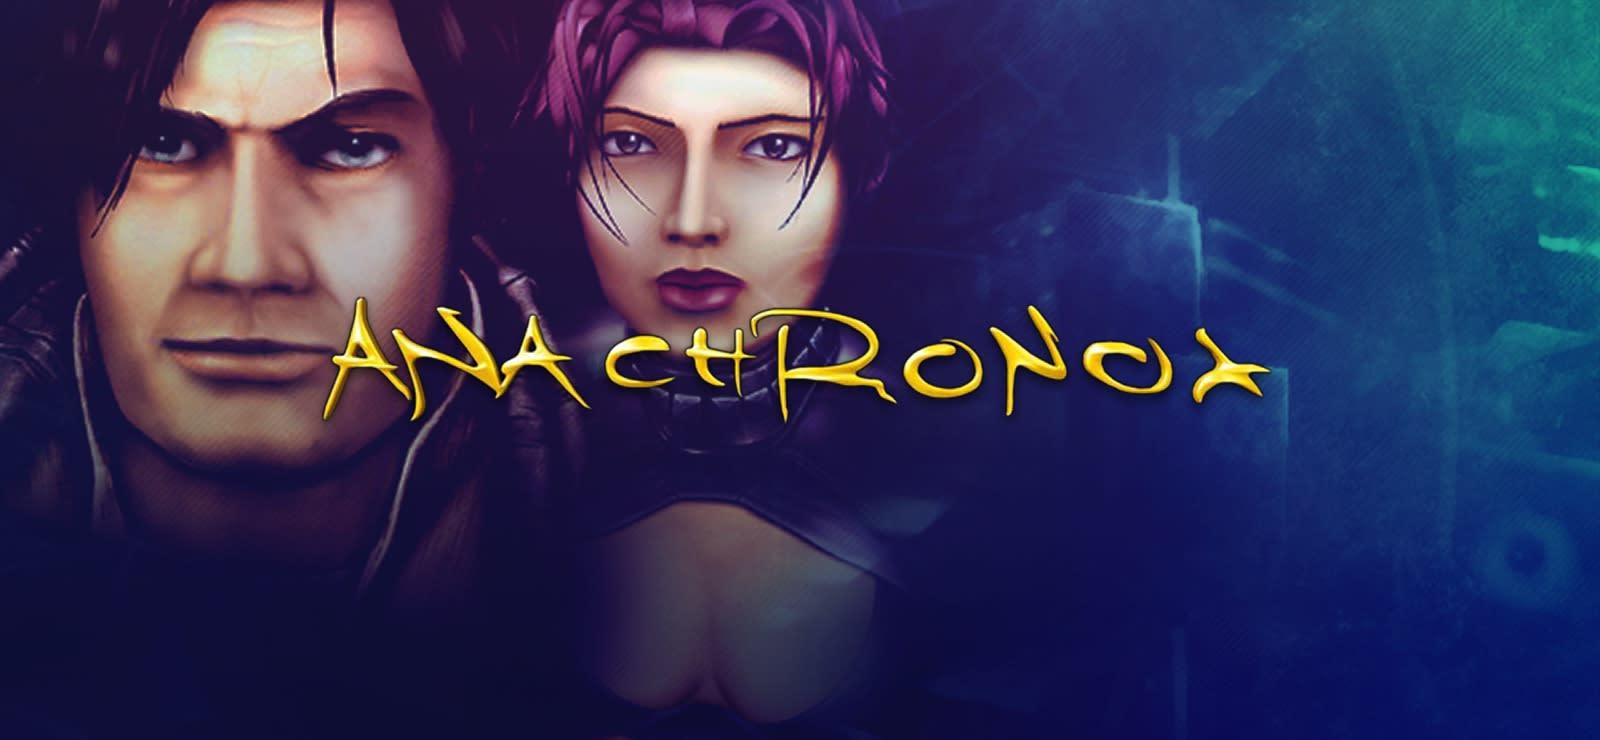 Anachronox